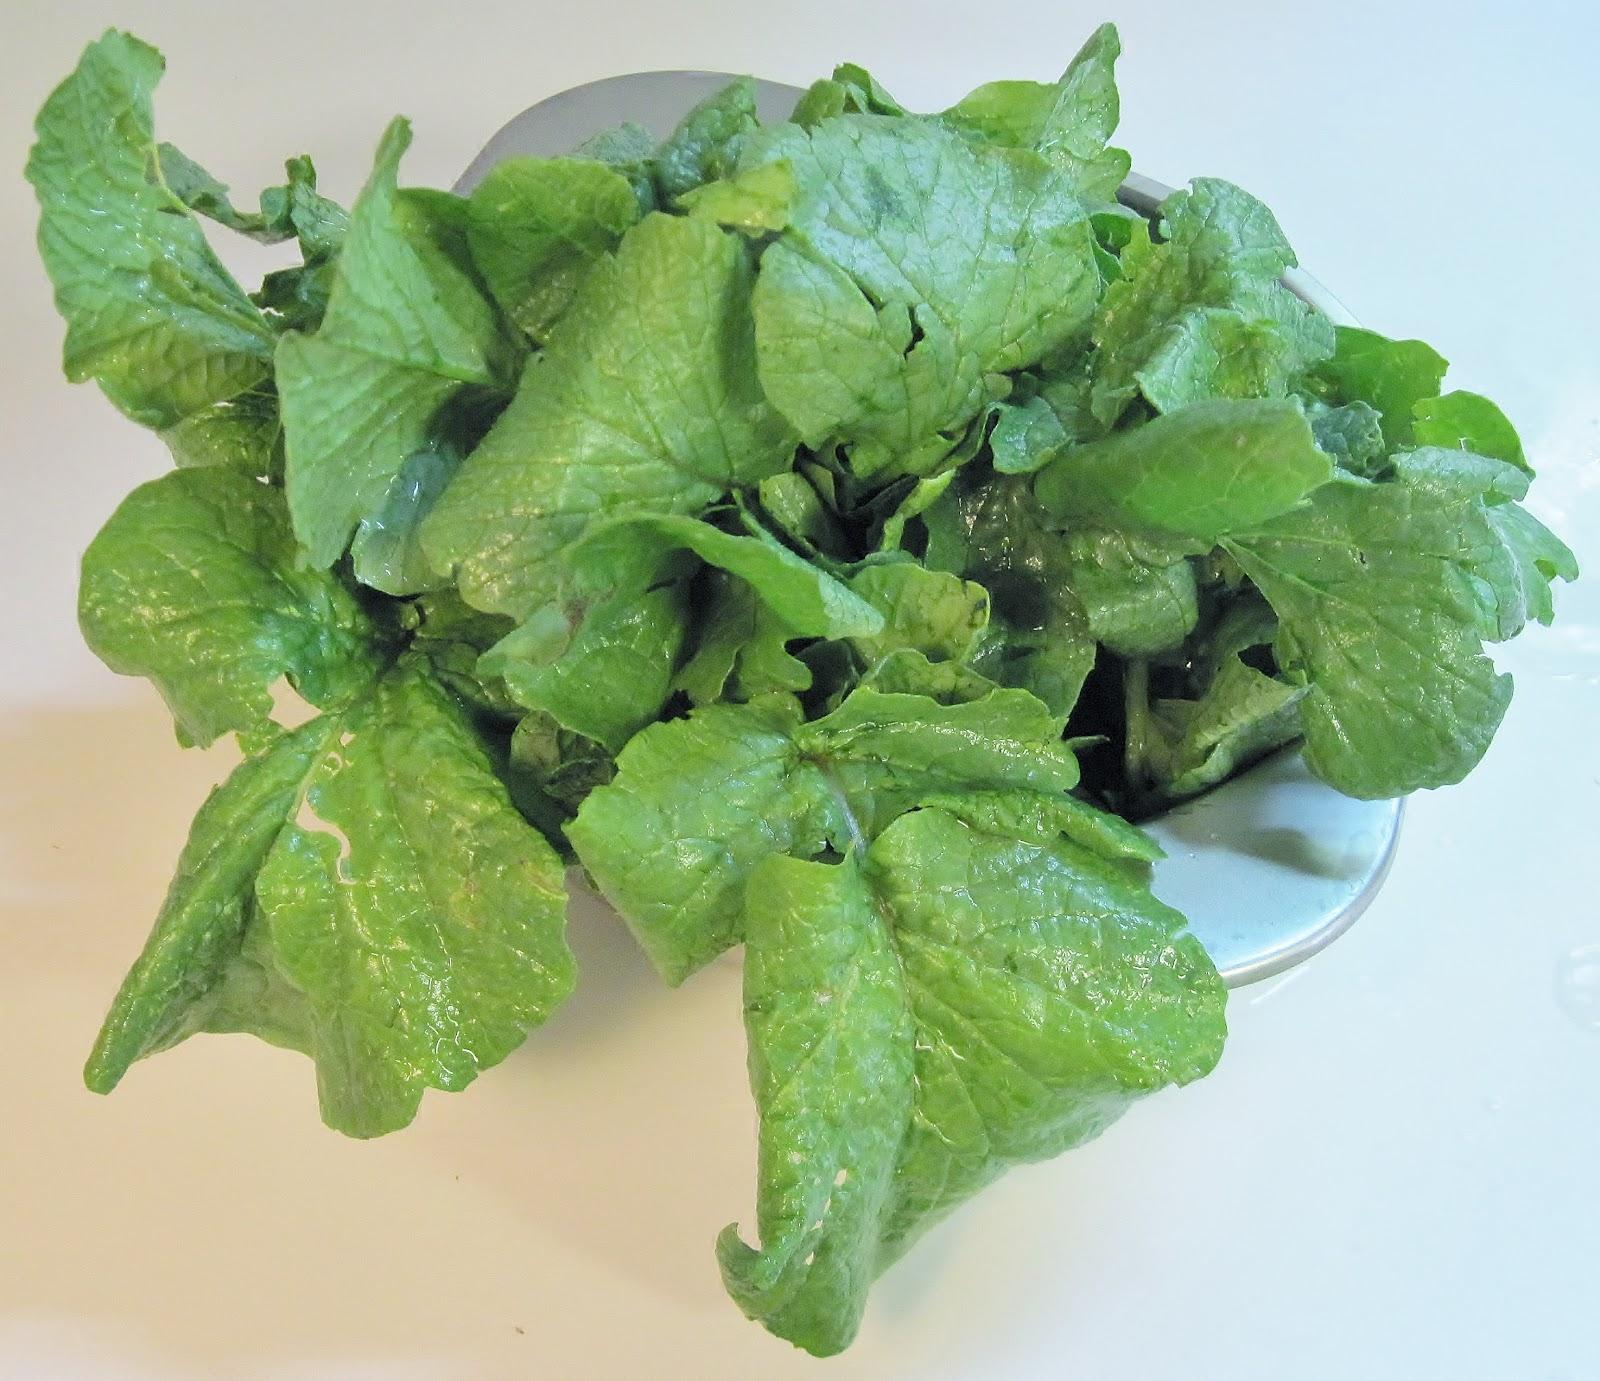 Radish greens radish greens are perfectly edible with a slightly